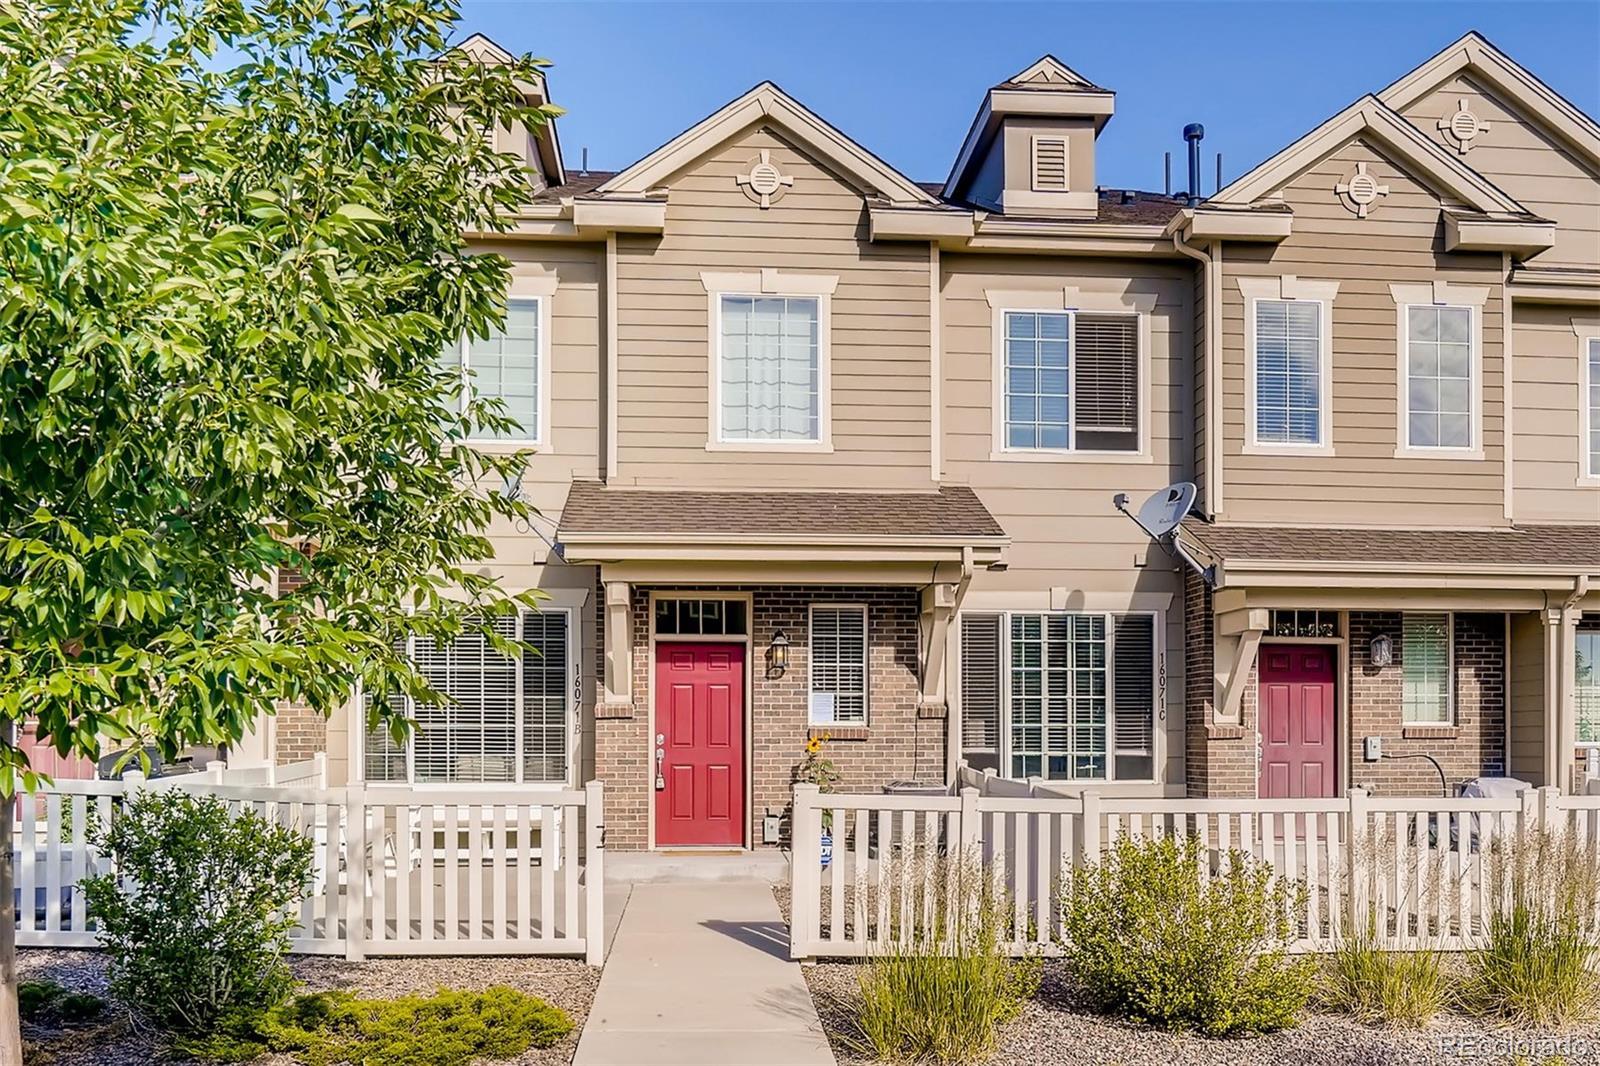 16071 W 63rd Lane #B Property Photo - Arvada, CO real estate listing